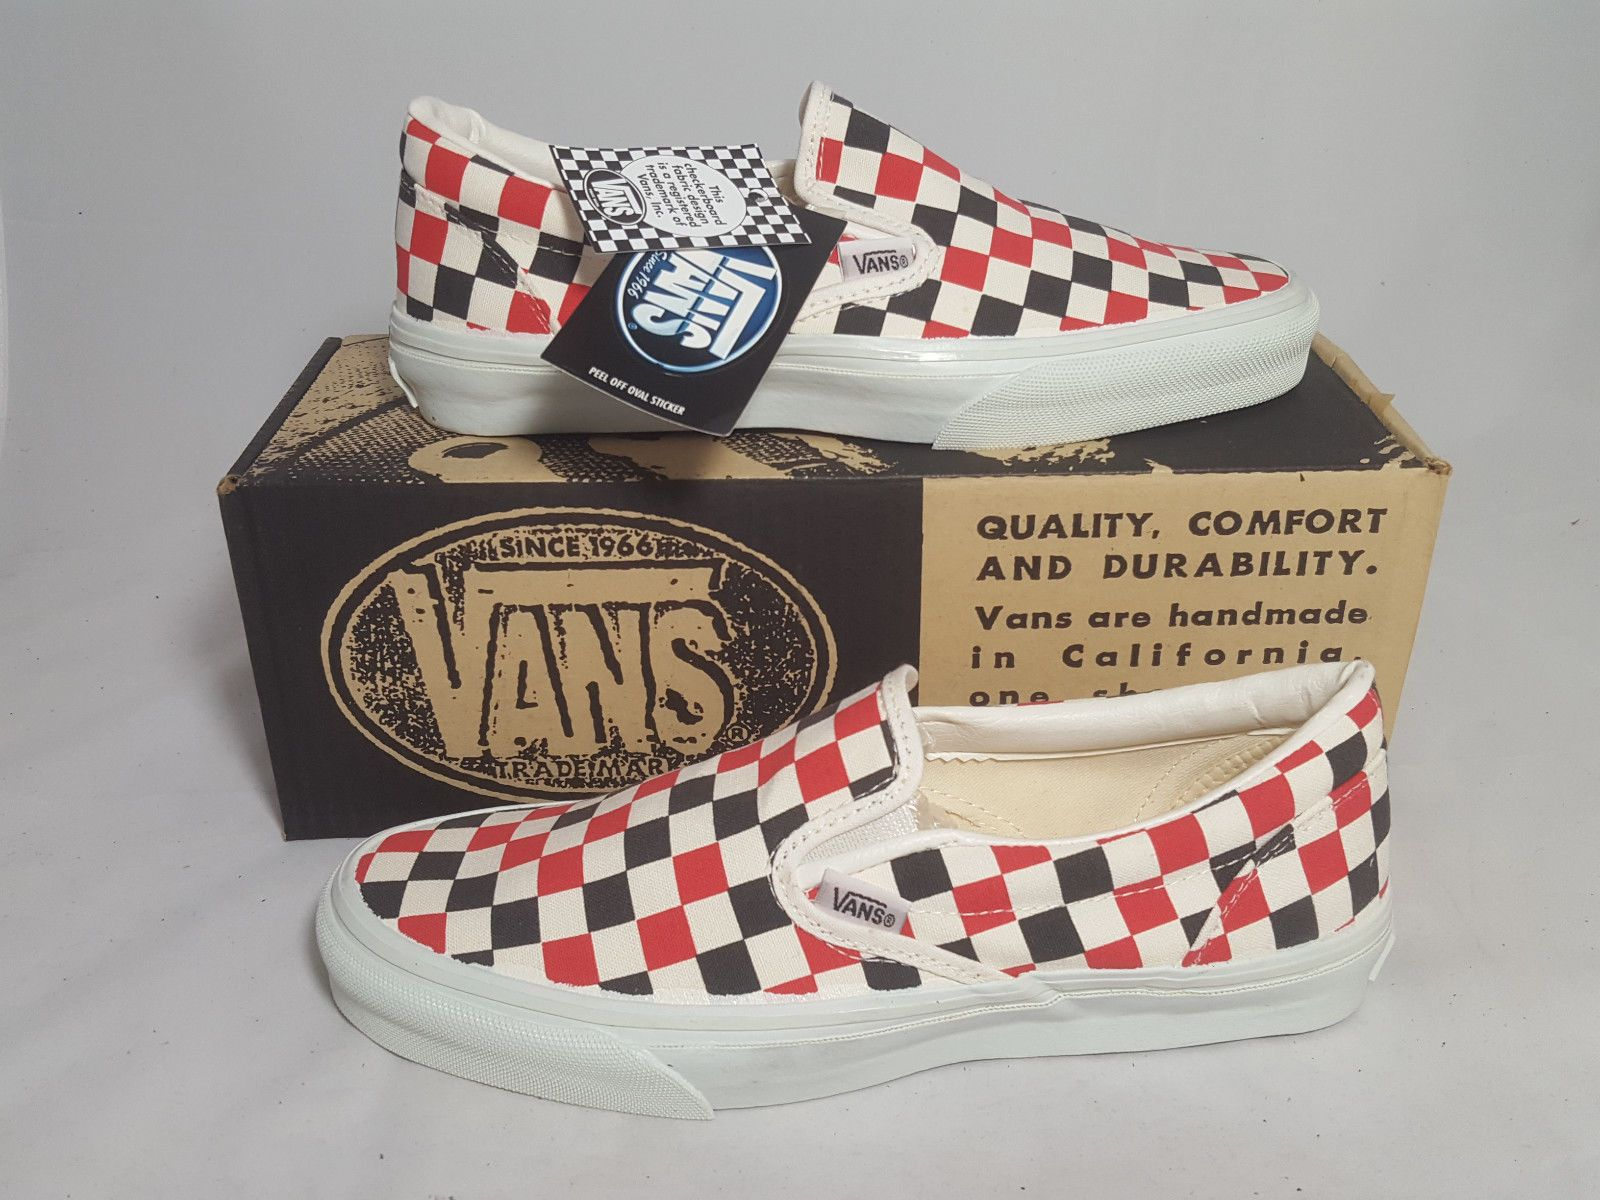 Vintage Vans Slip On Shoes Multi Checkers Made Usa Men S Size 9 Nos Old Skool Sk8 Vans Slip On Shoes Vans Slip On Vans